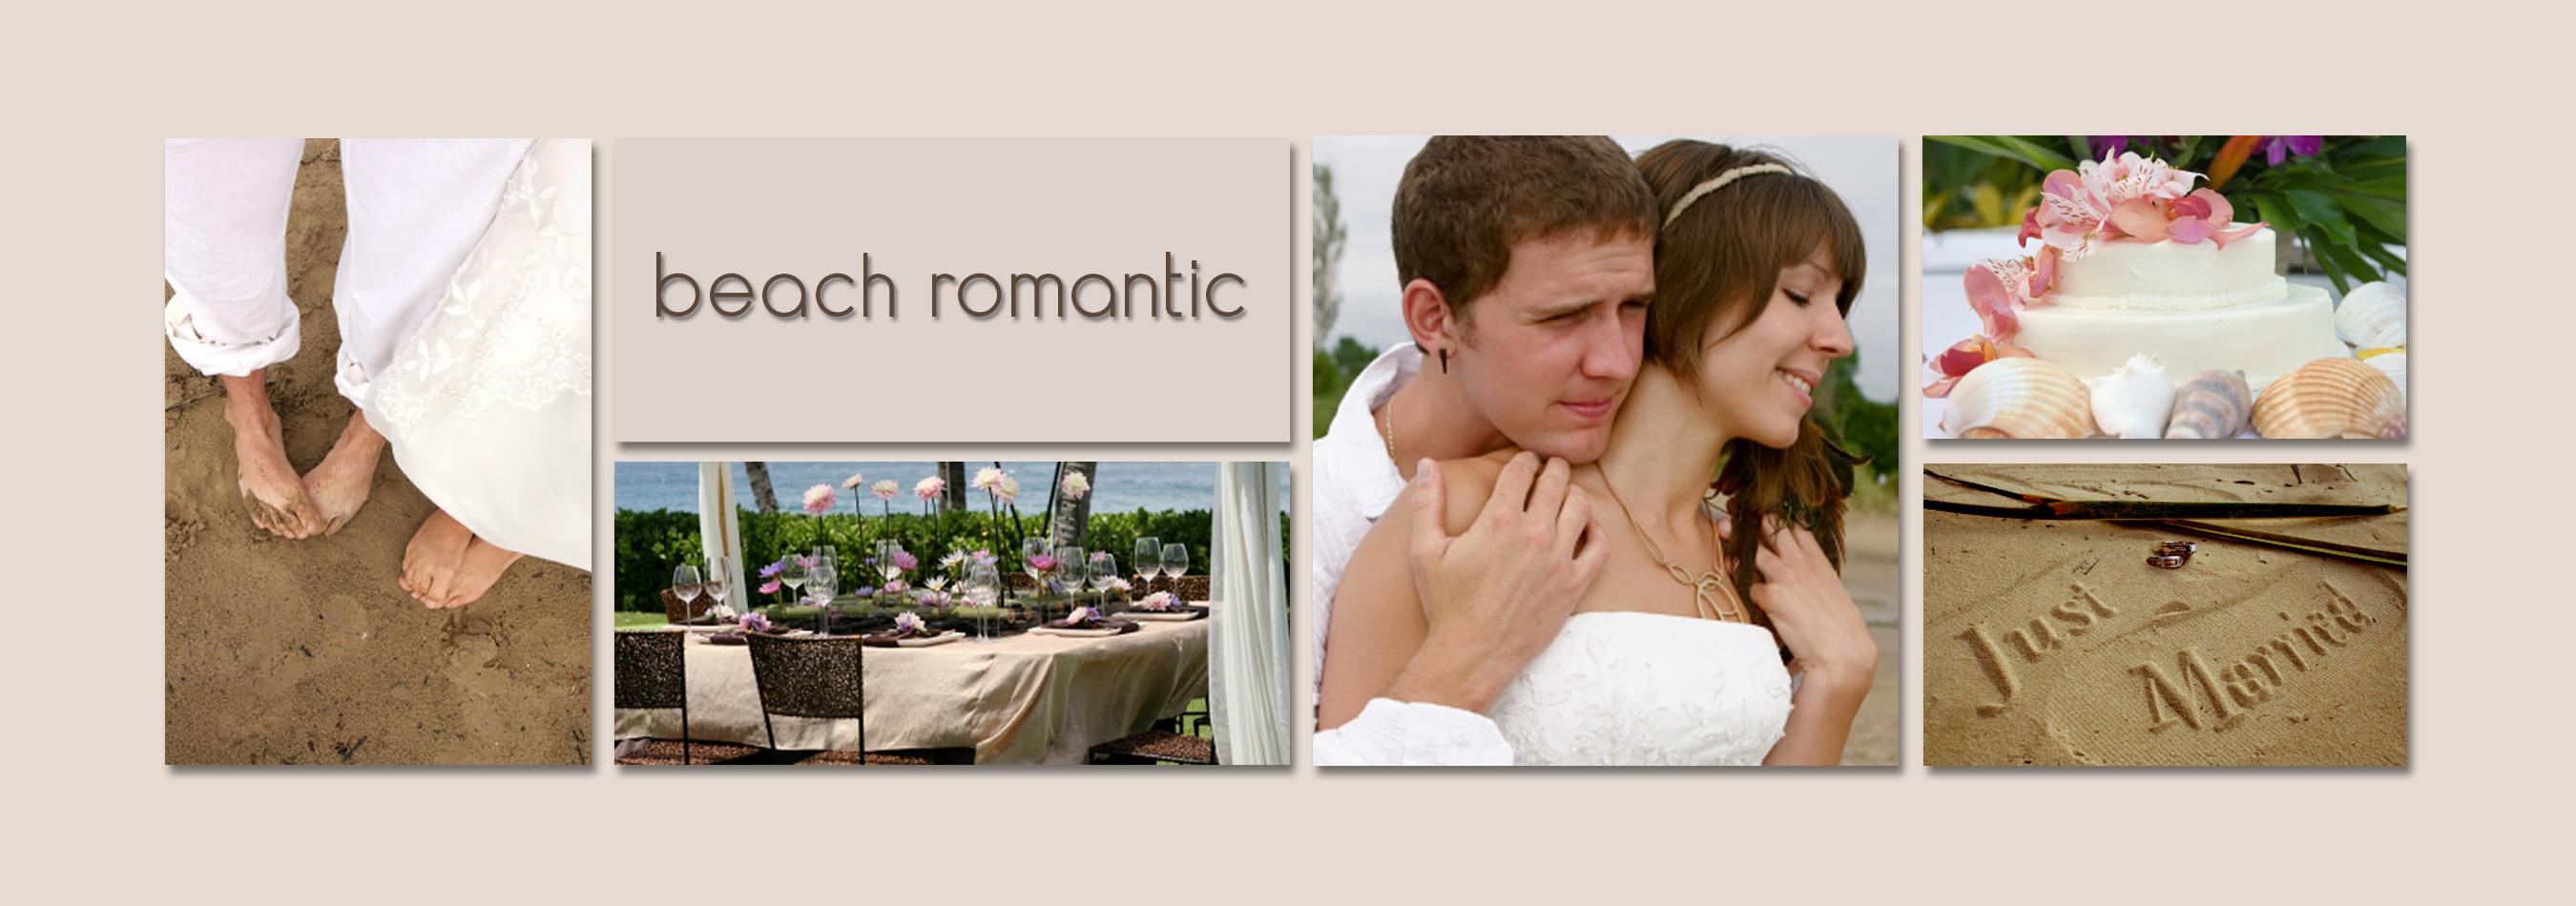 01_beach-romantic_ersatz.jpg